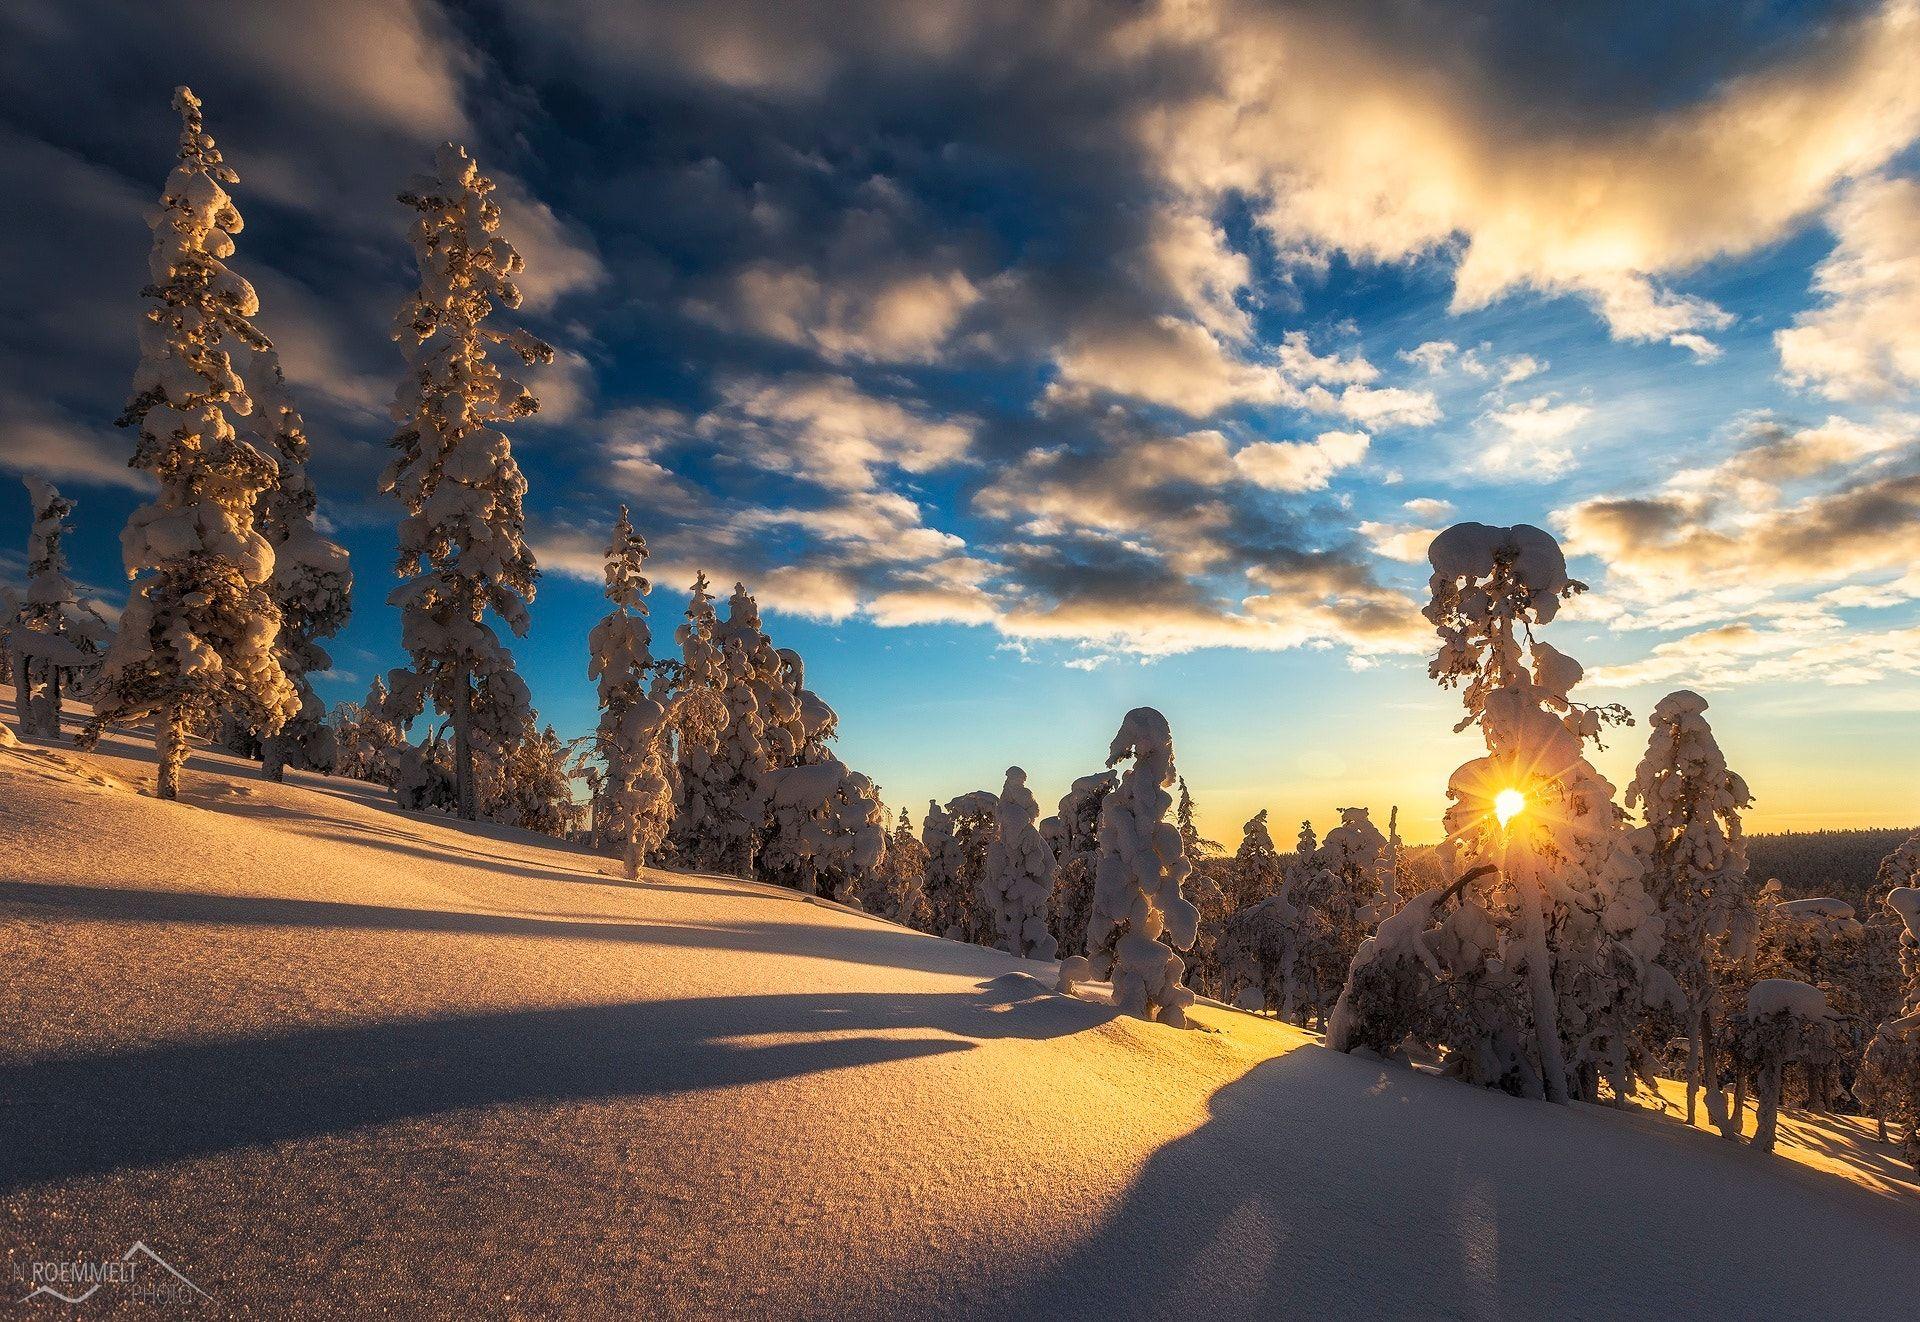 Golden light - Sunnset in Finland during Winter